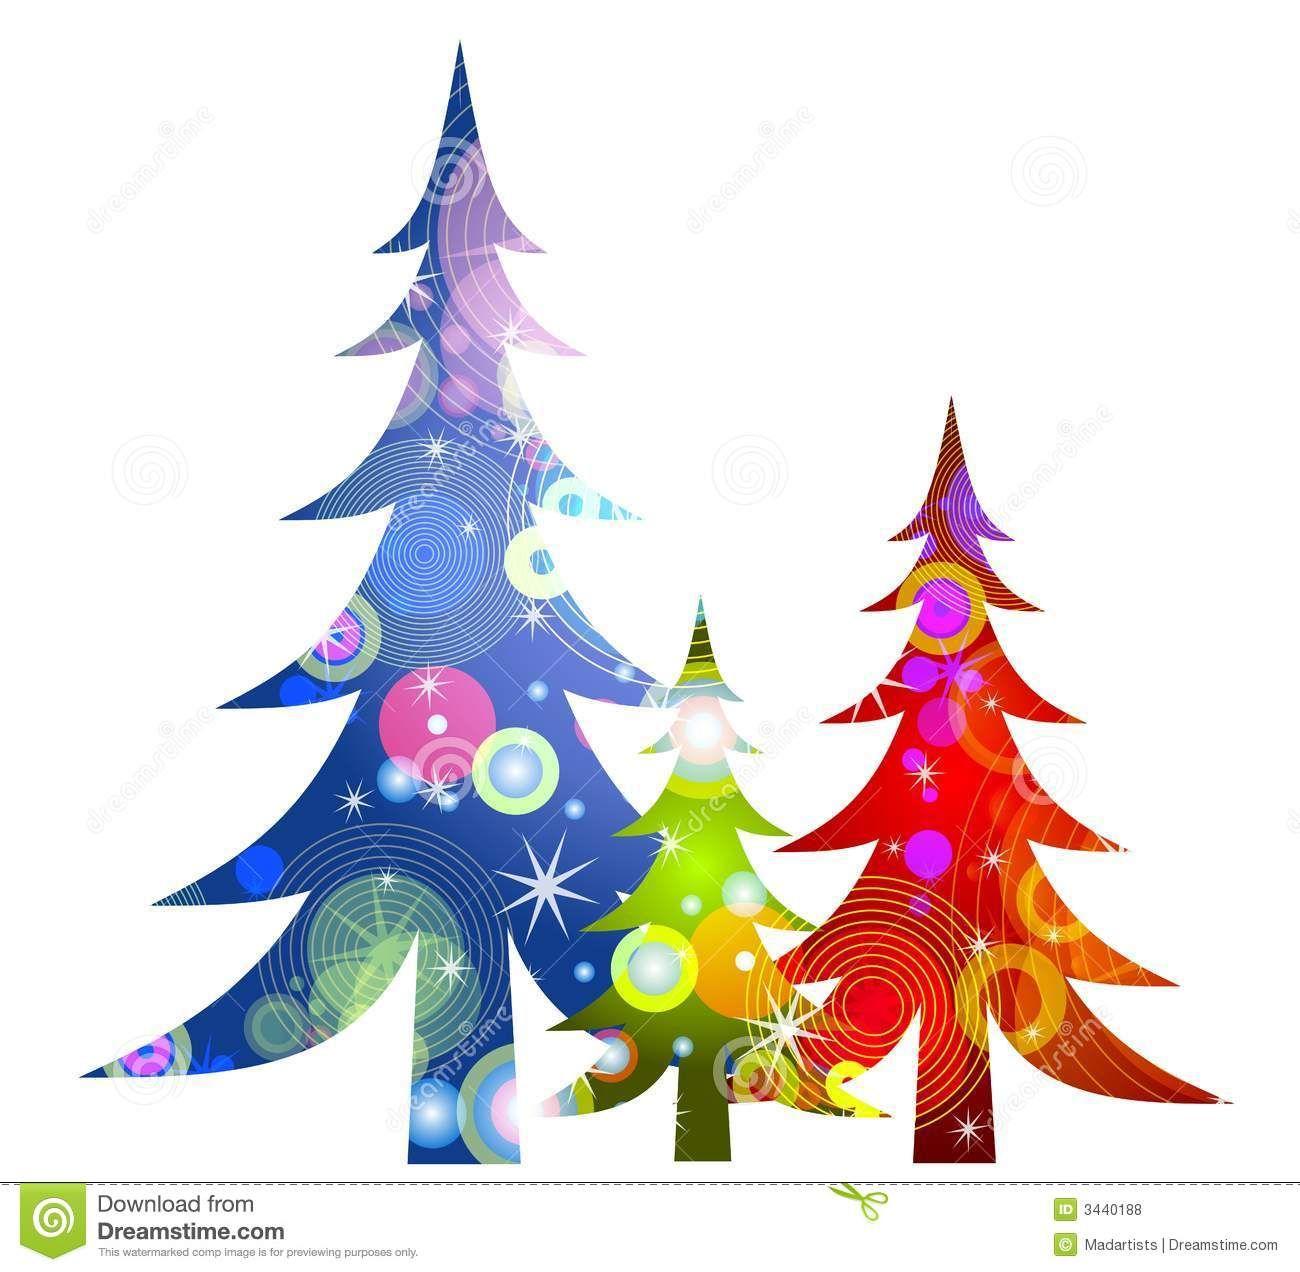 hight resolution of 1300x1272 retro christmas trees clip art royalty free stock photos